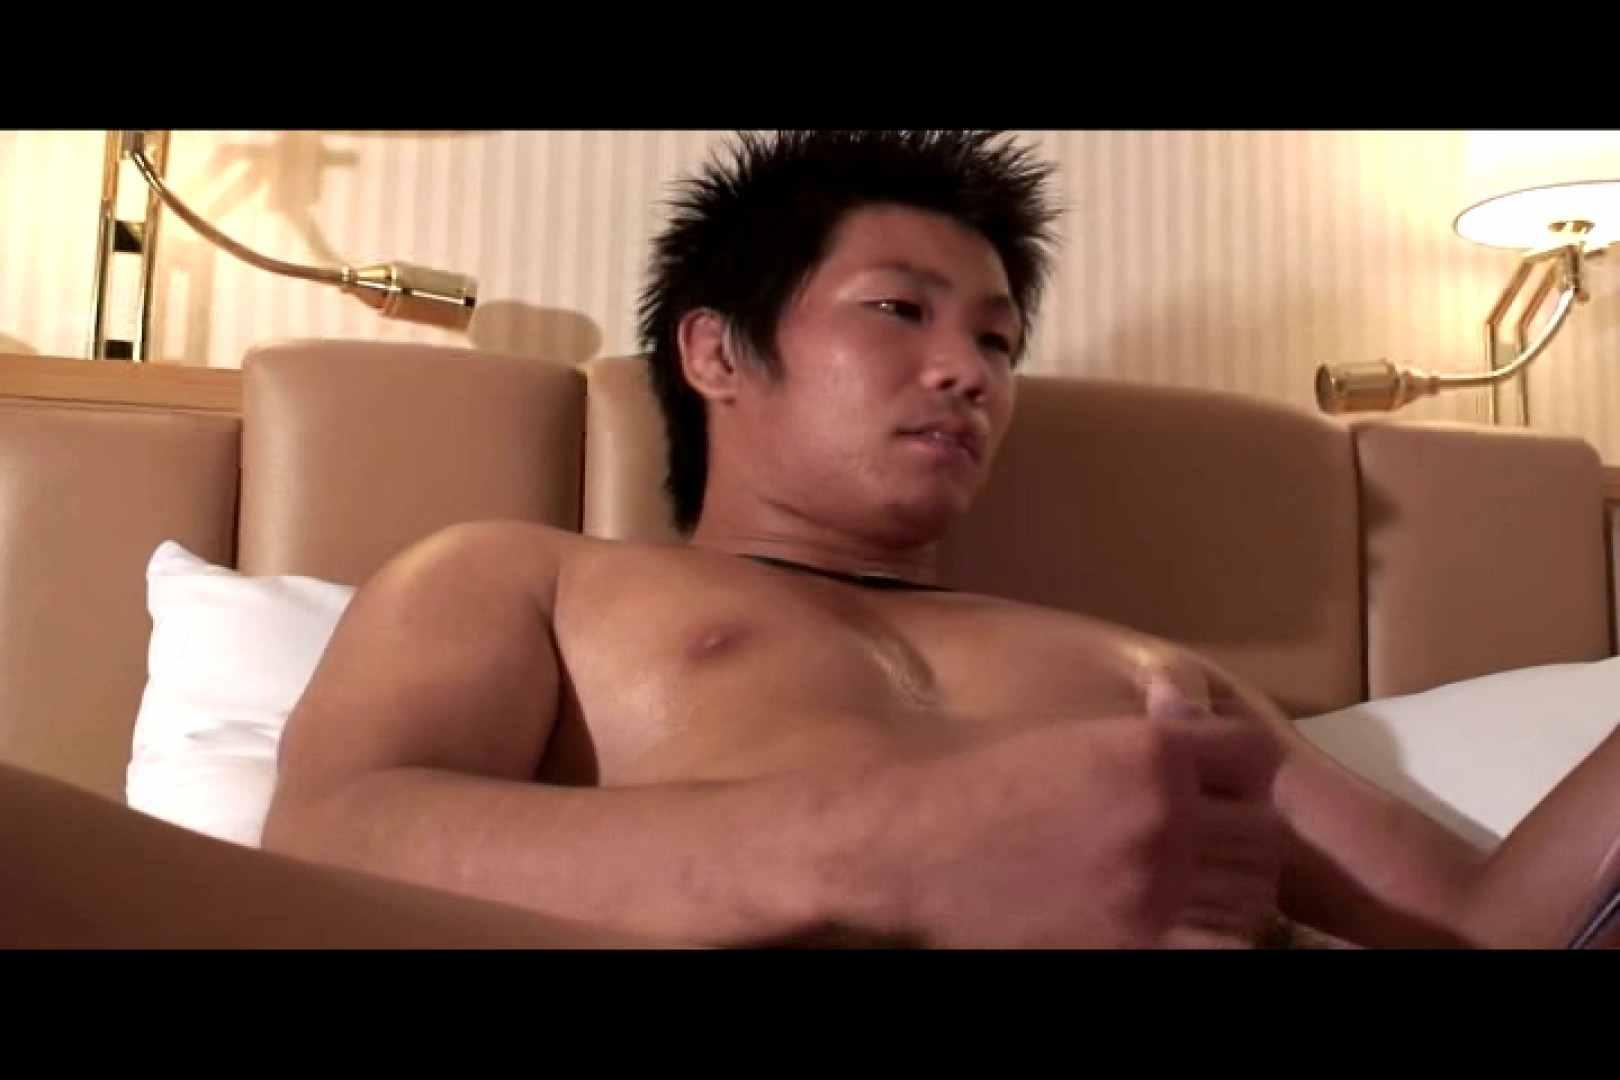 Bistro「イケメン」~Mokkori和風仕立て~vol.03 受け  55pic 7